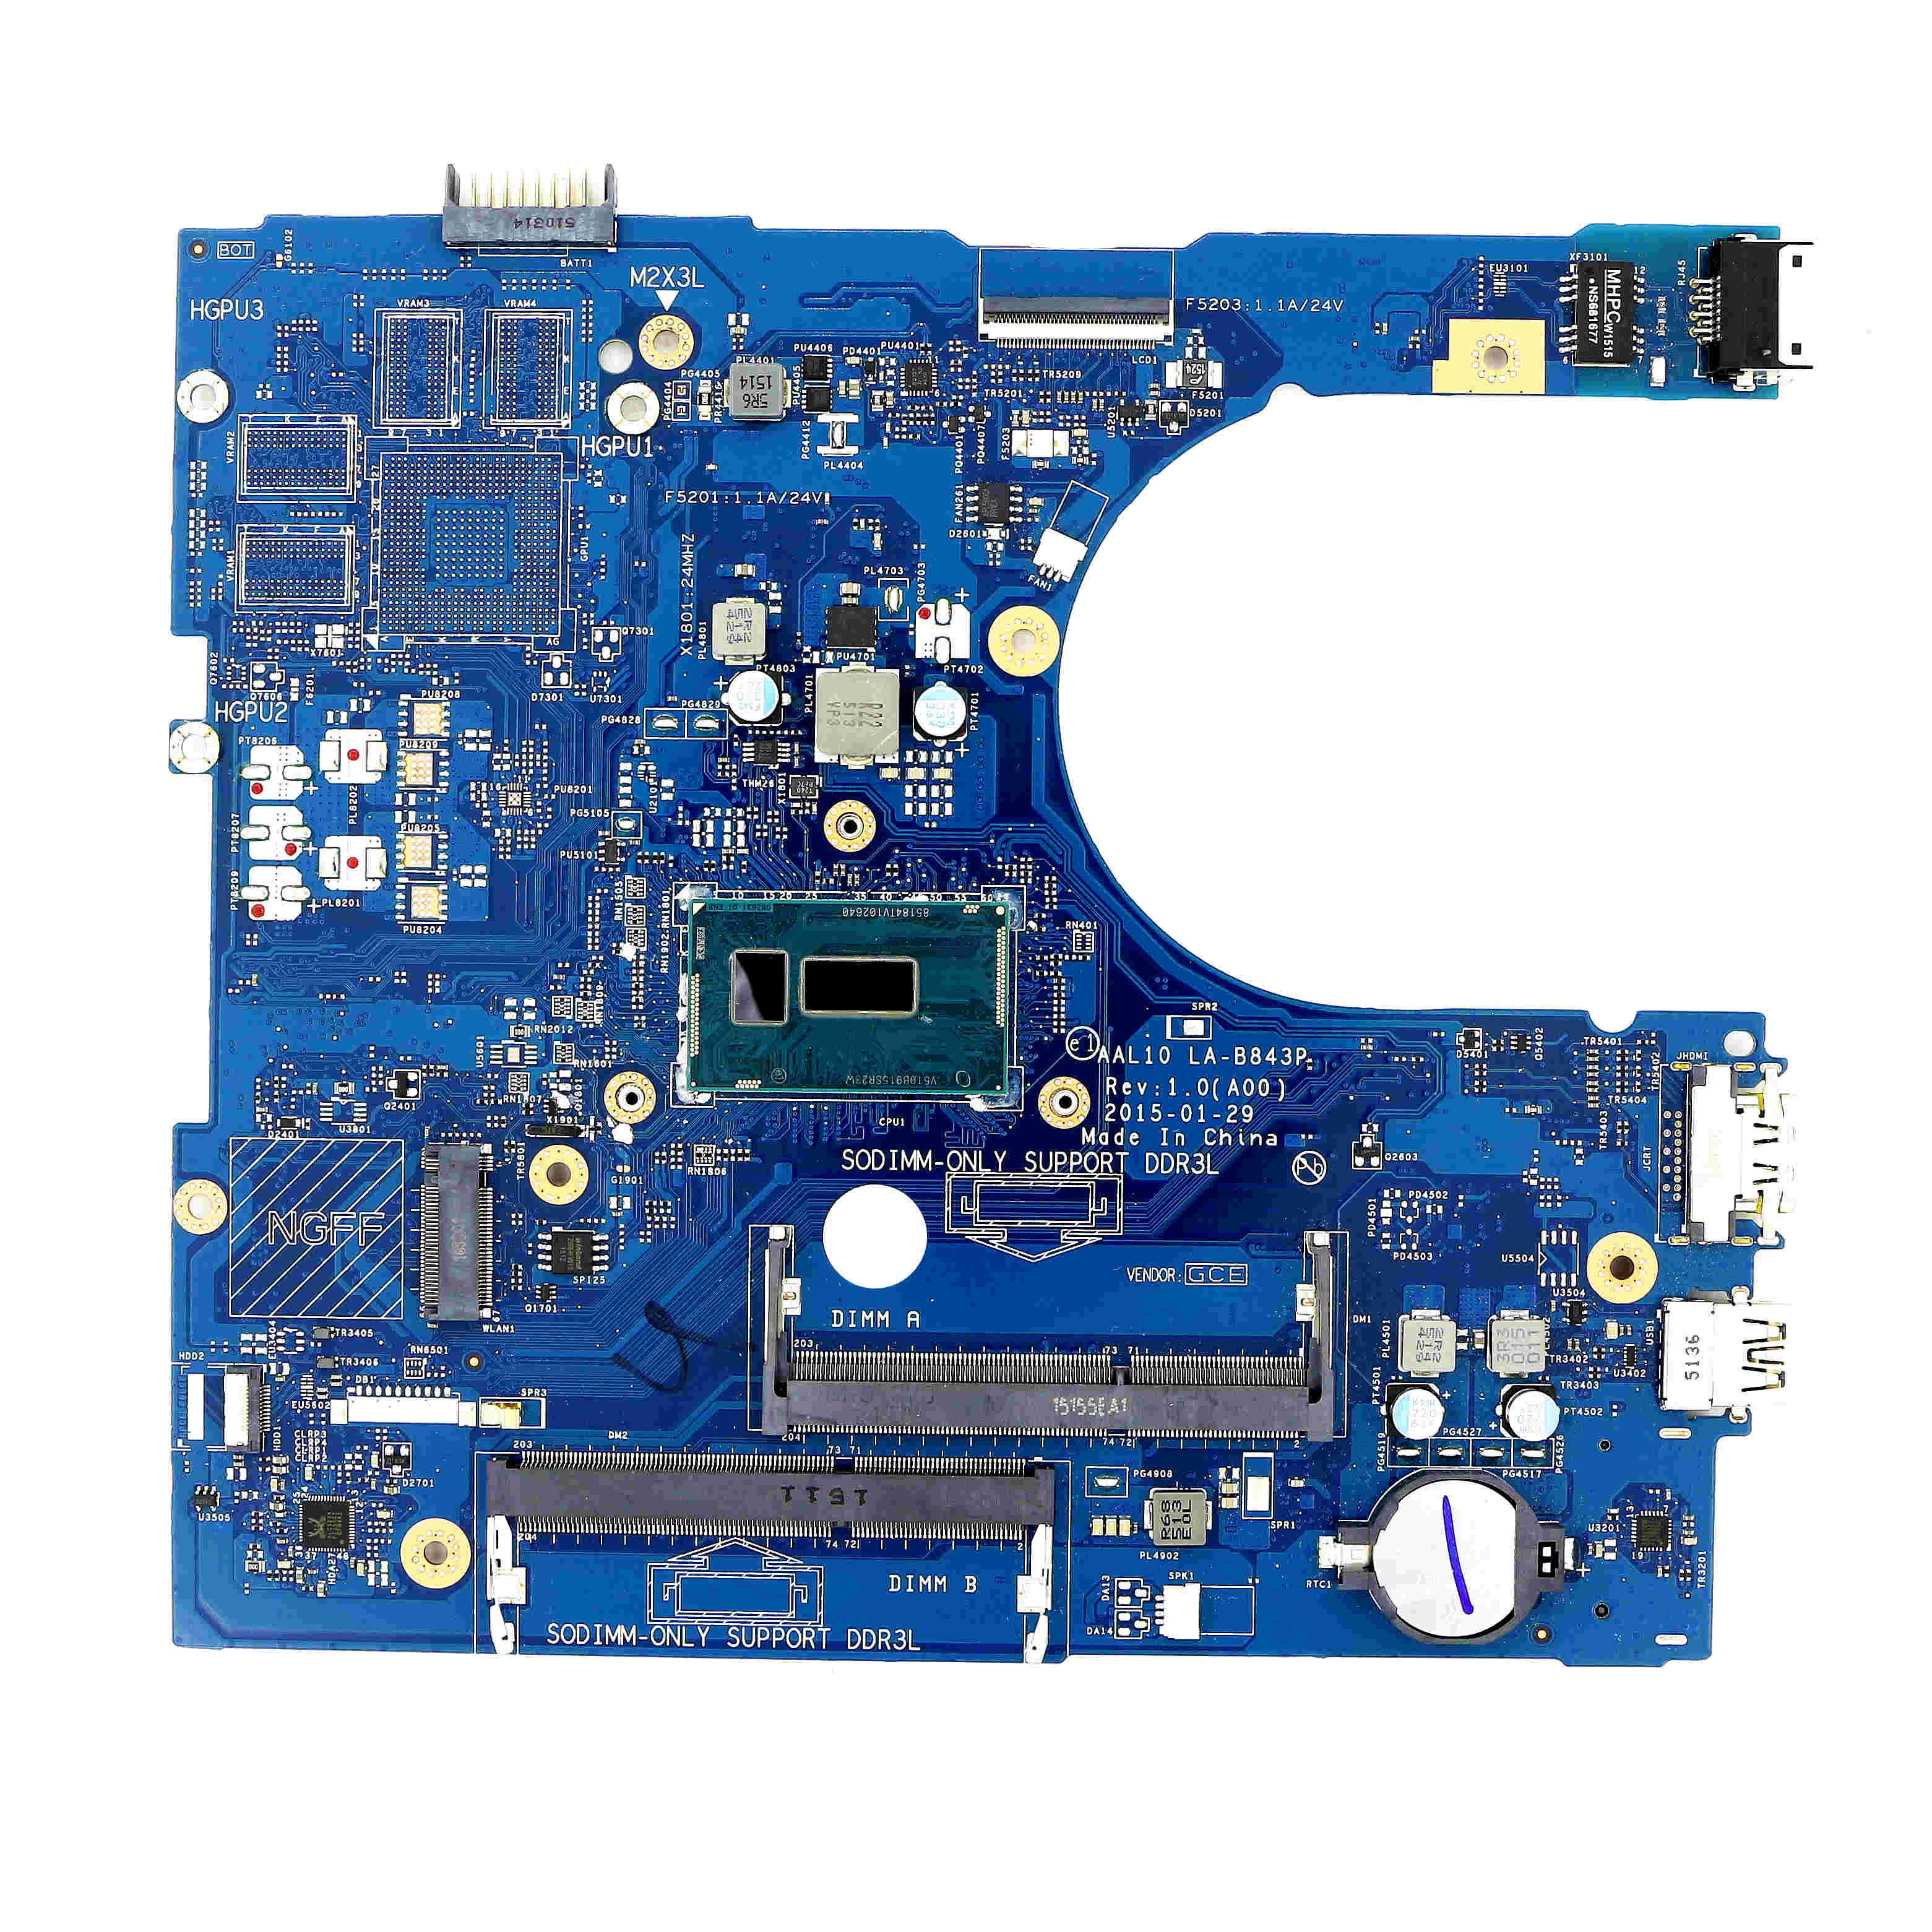 RC3PN-حقيقية Laptop العمل UMA DDR3L اللوحة AAL10 LA-B843P w/ i7-5500U لديل انسبايرون 15 5558 / 14 5458 / 17 5758